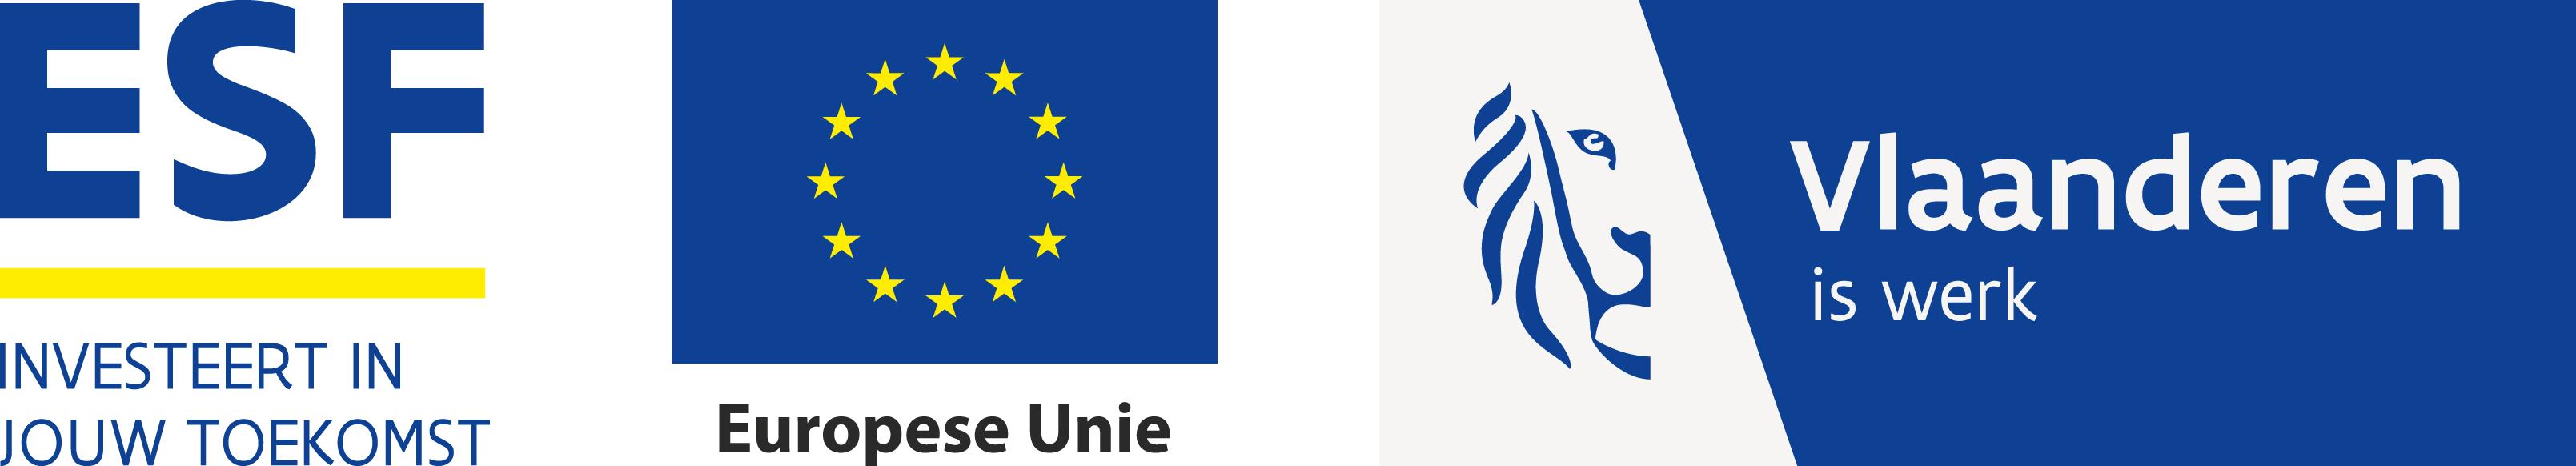 Europees Sociaal Fonds logo's